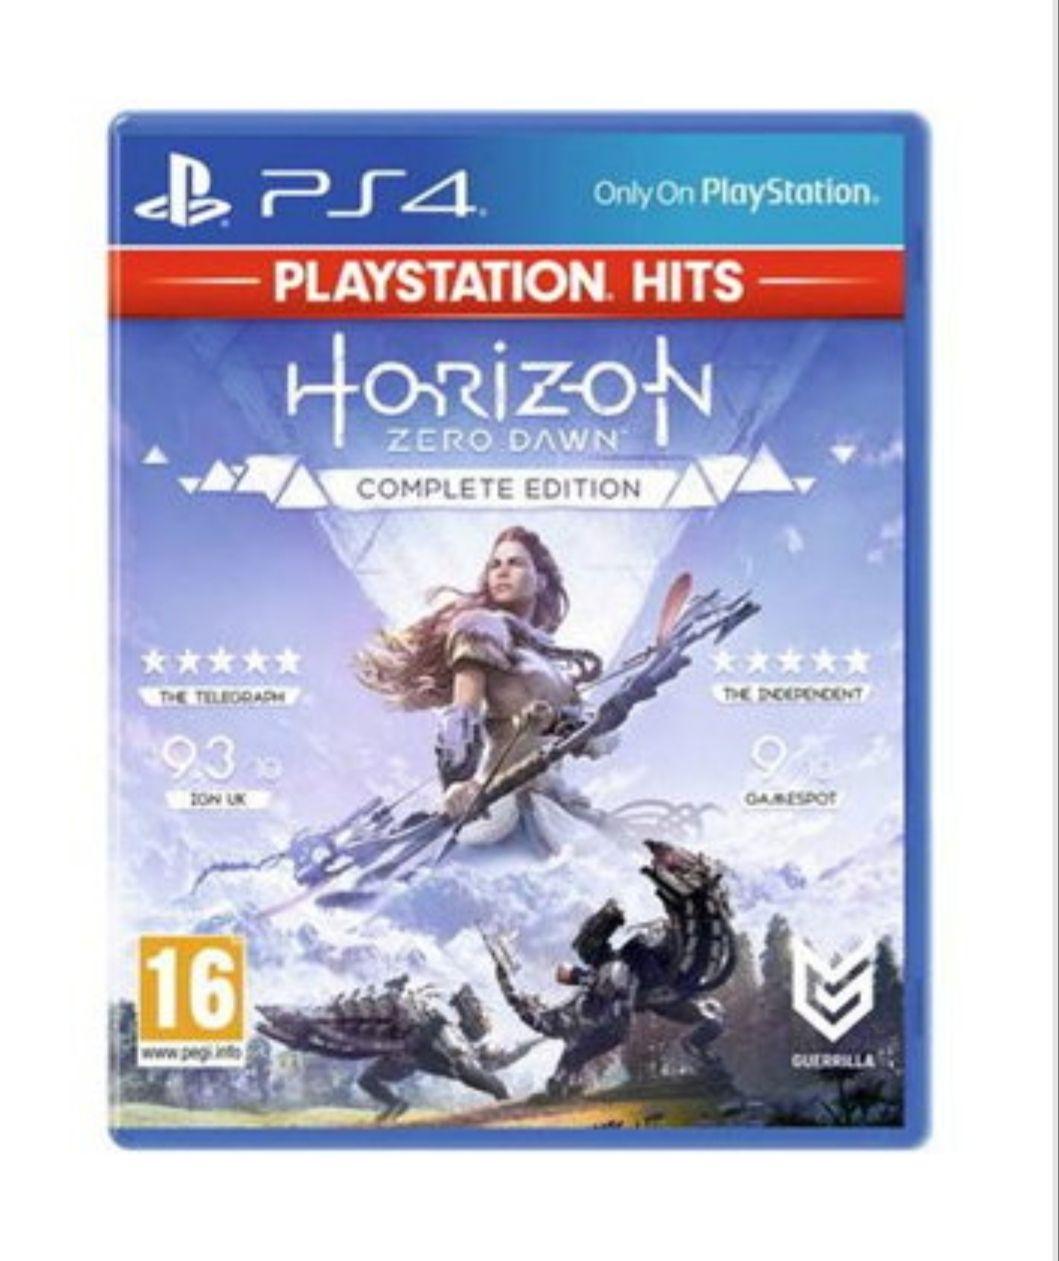 Horizon Zero Dawn Complete Edition - PlayStation Hits (PS4) - £11.85 @ Base